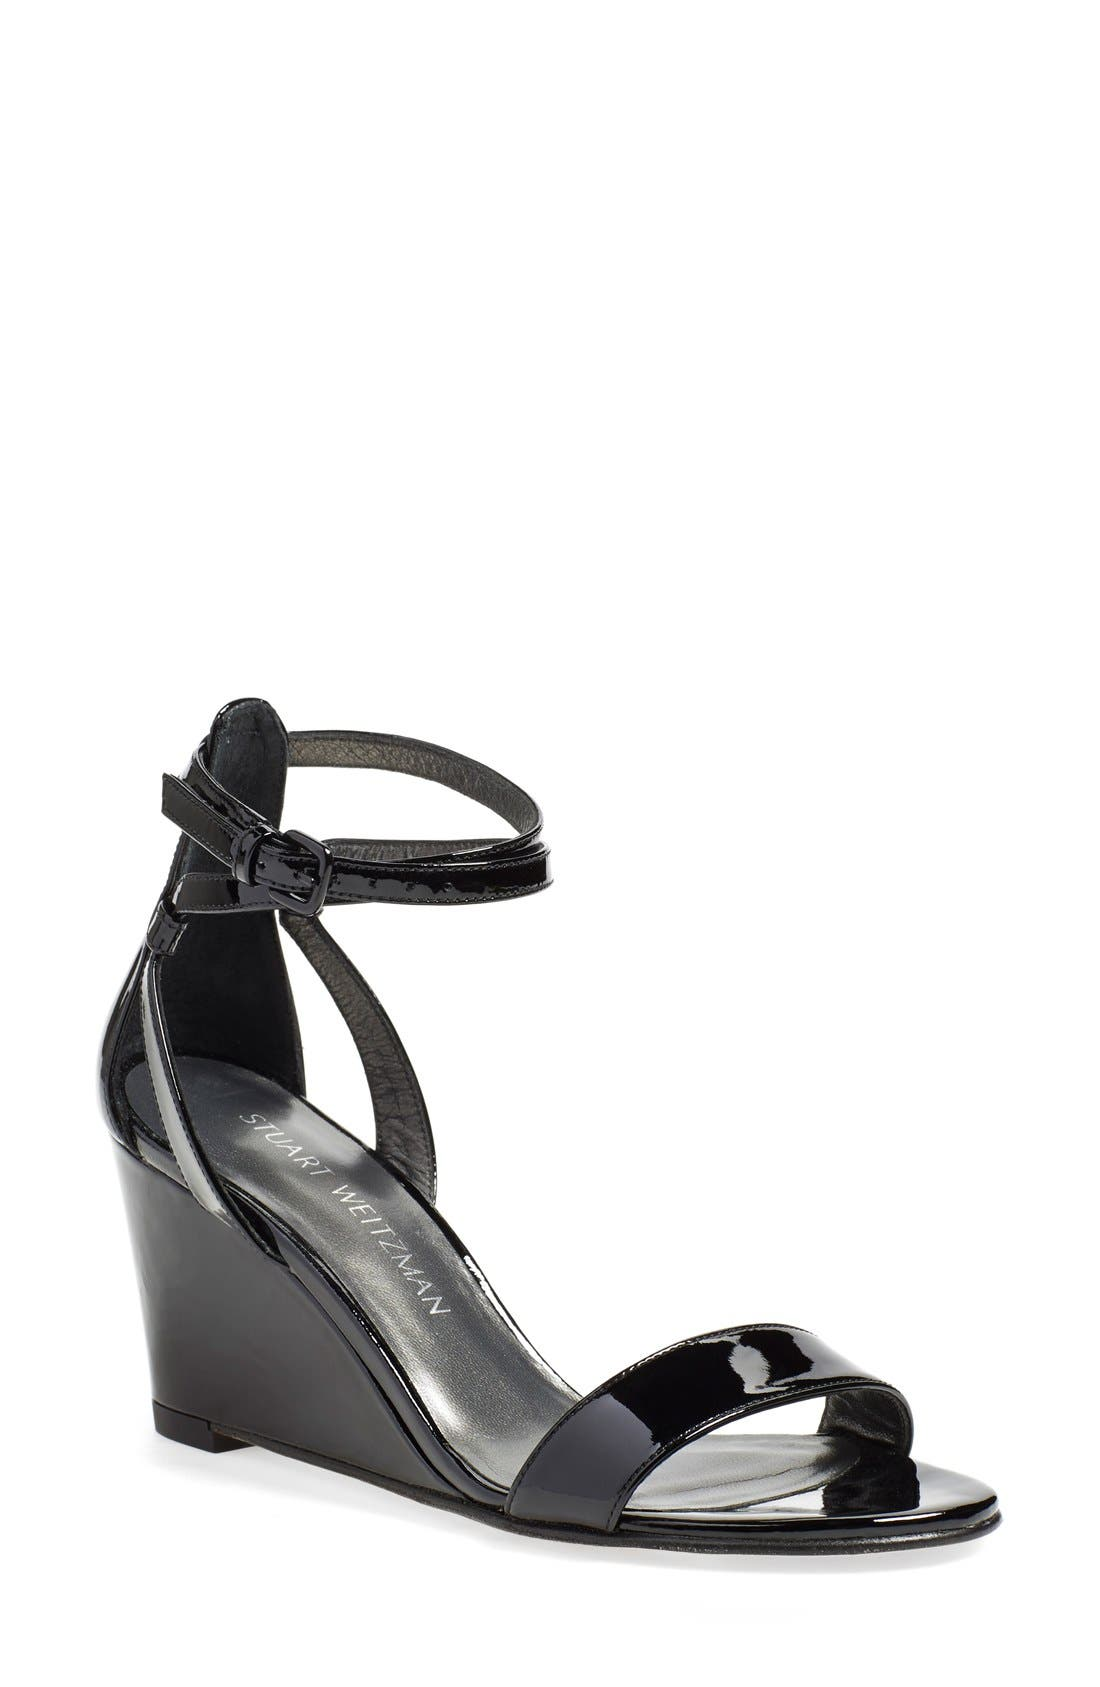 'Backdraft' Ankle Strap Wedge Sandal, Main, color, 002